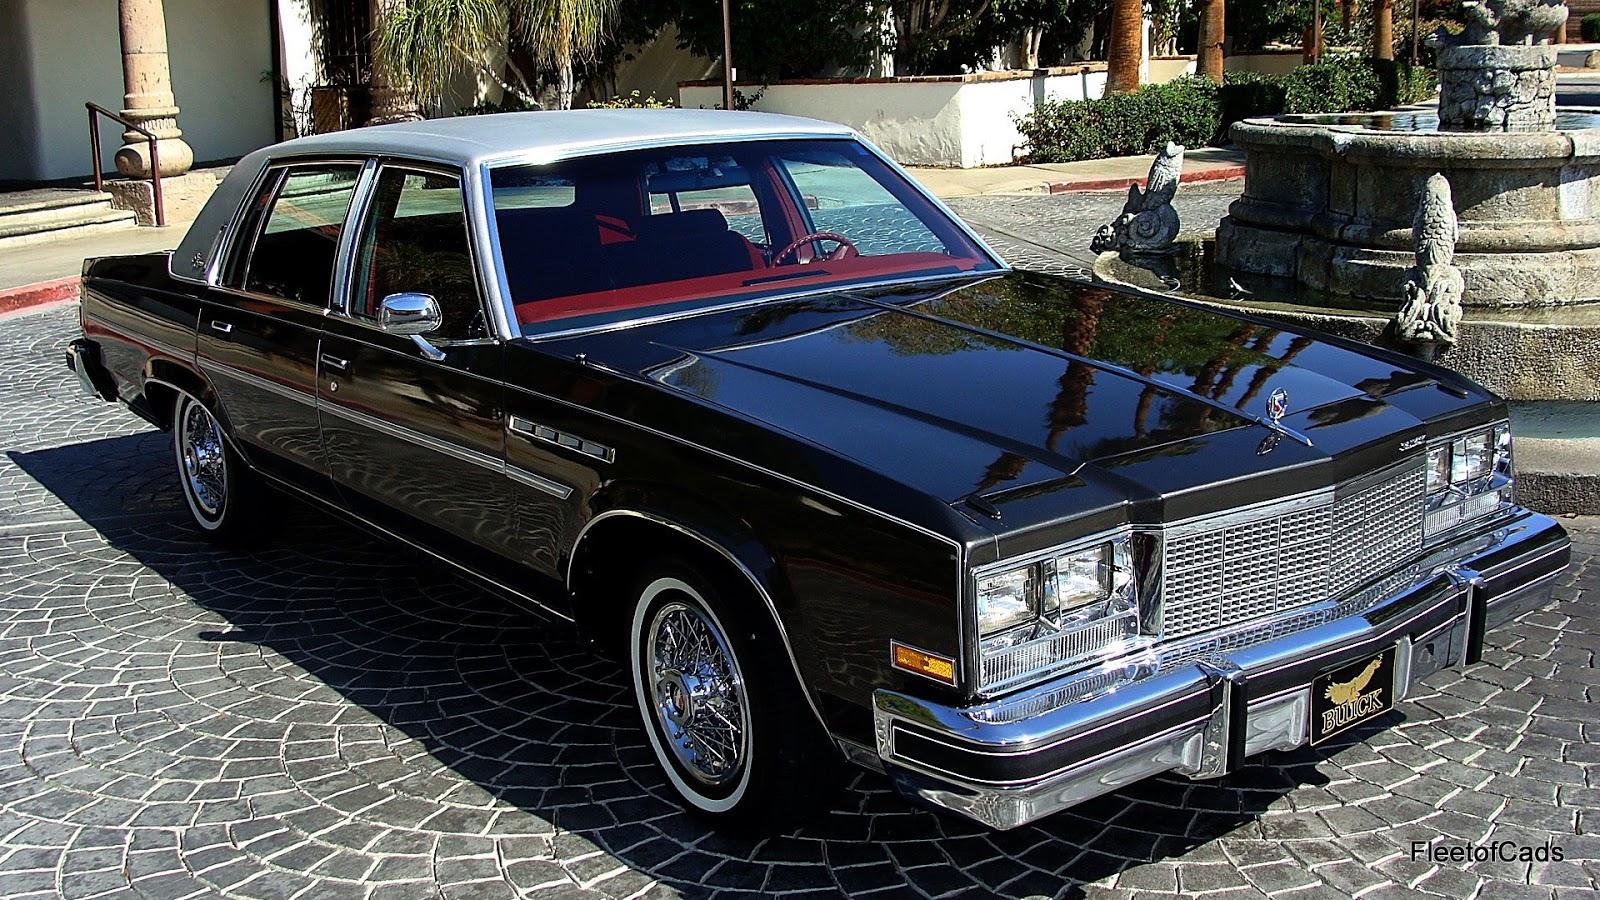 All American Classic Cars: 1979 Buick Electra Park Avenue 4-Door Sedan